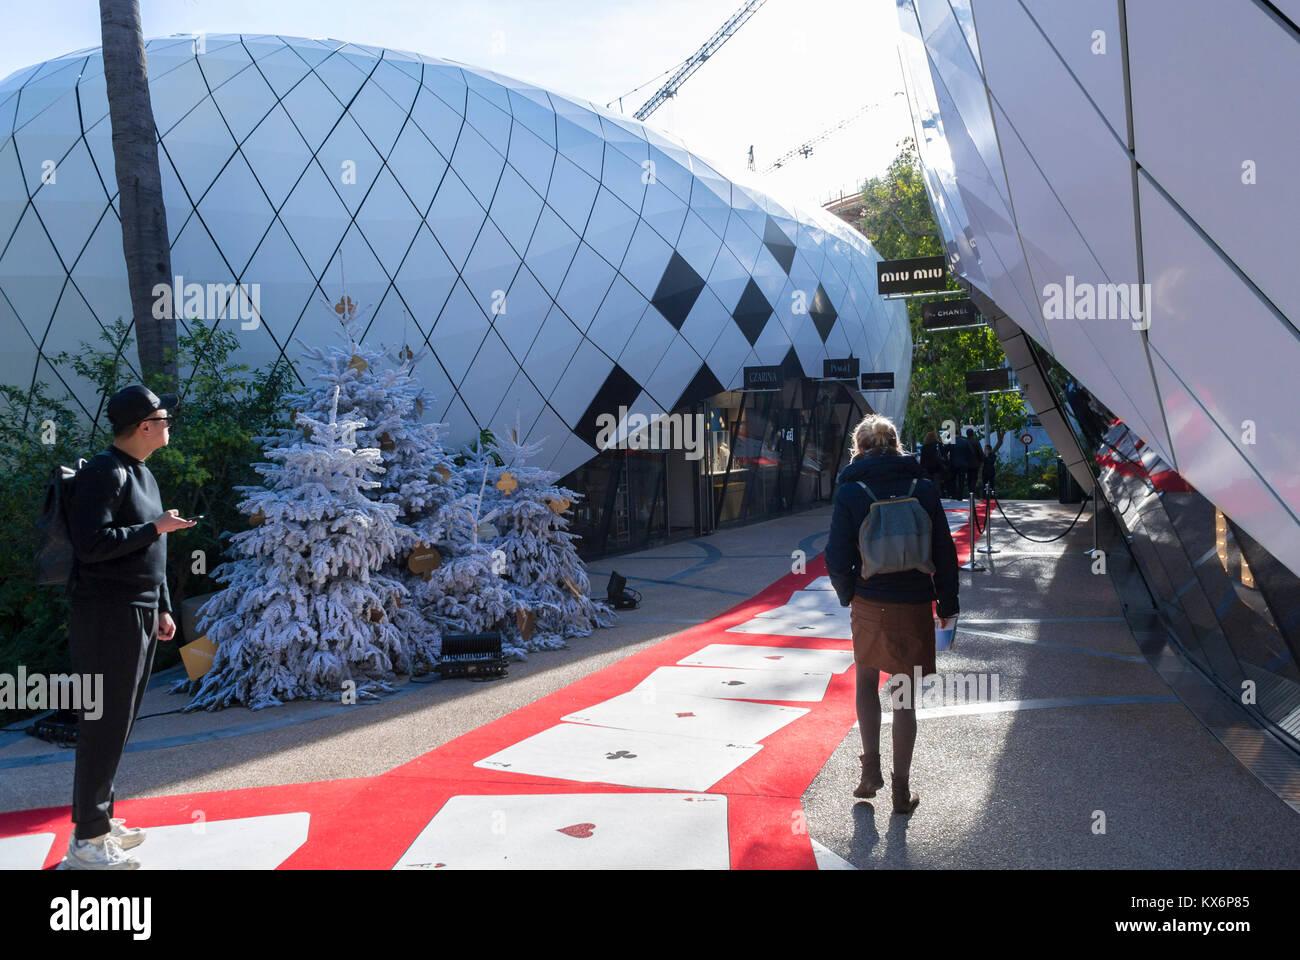 Monaco, Monte Carlo, Les Pavillions, Luxury Shops, Shopping Center, Chinese Tourists Visiting Balenciaga Store, - Stock Image